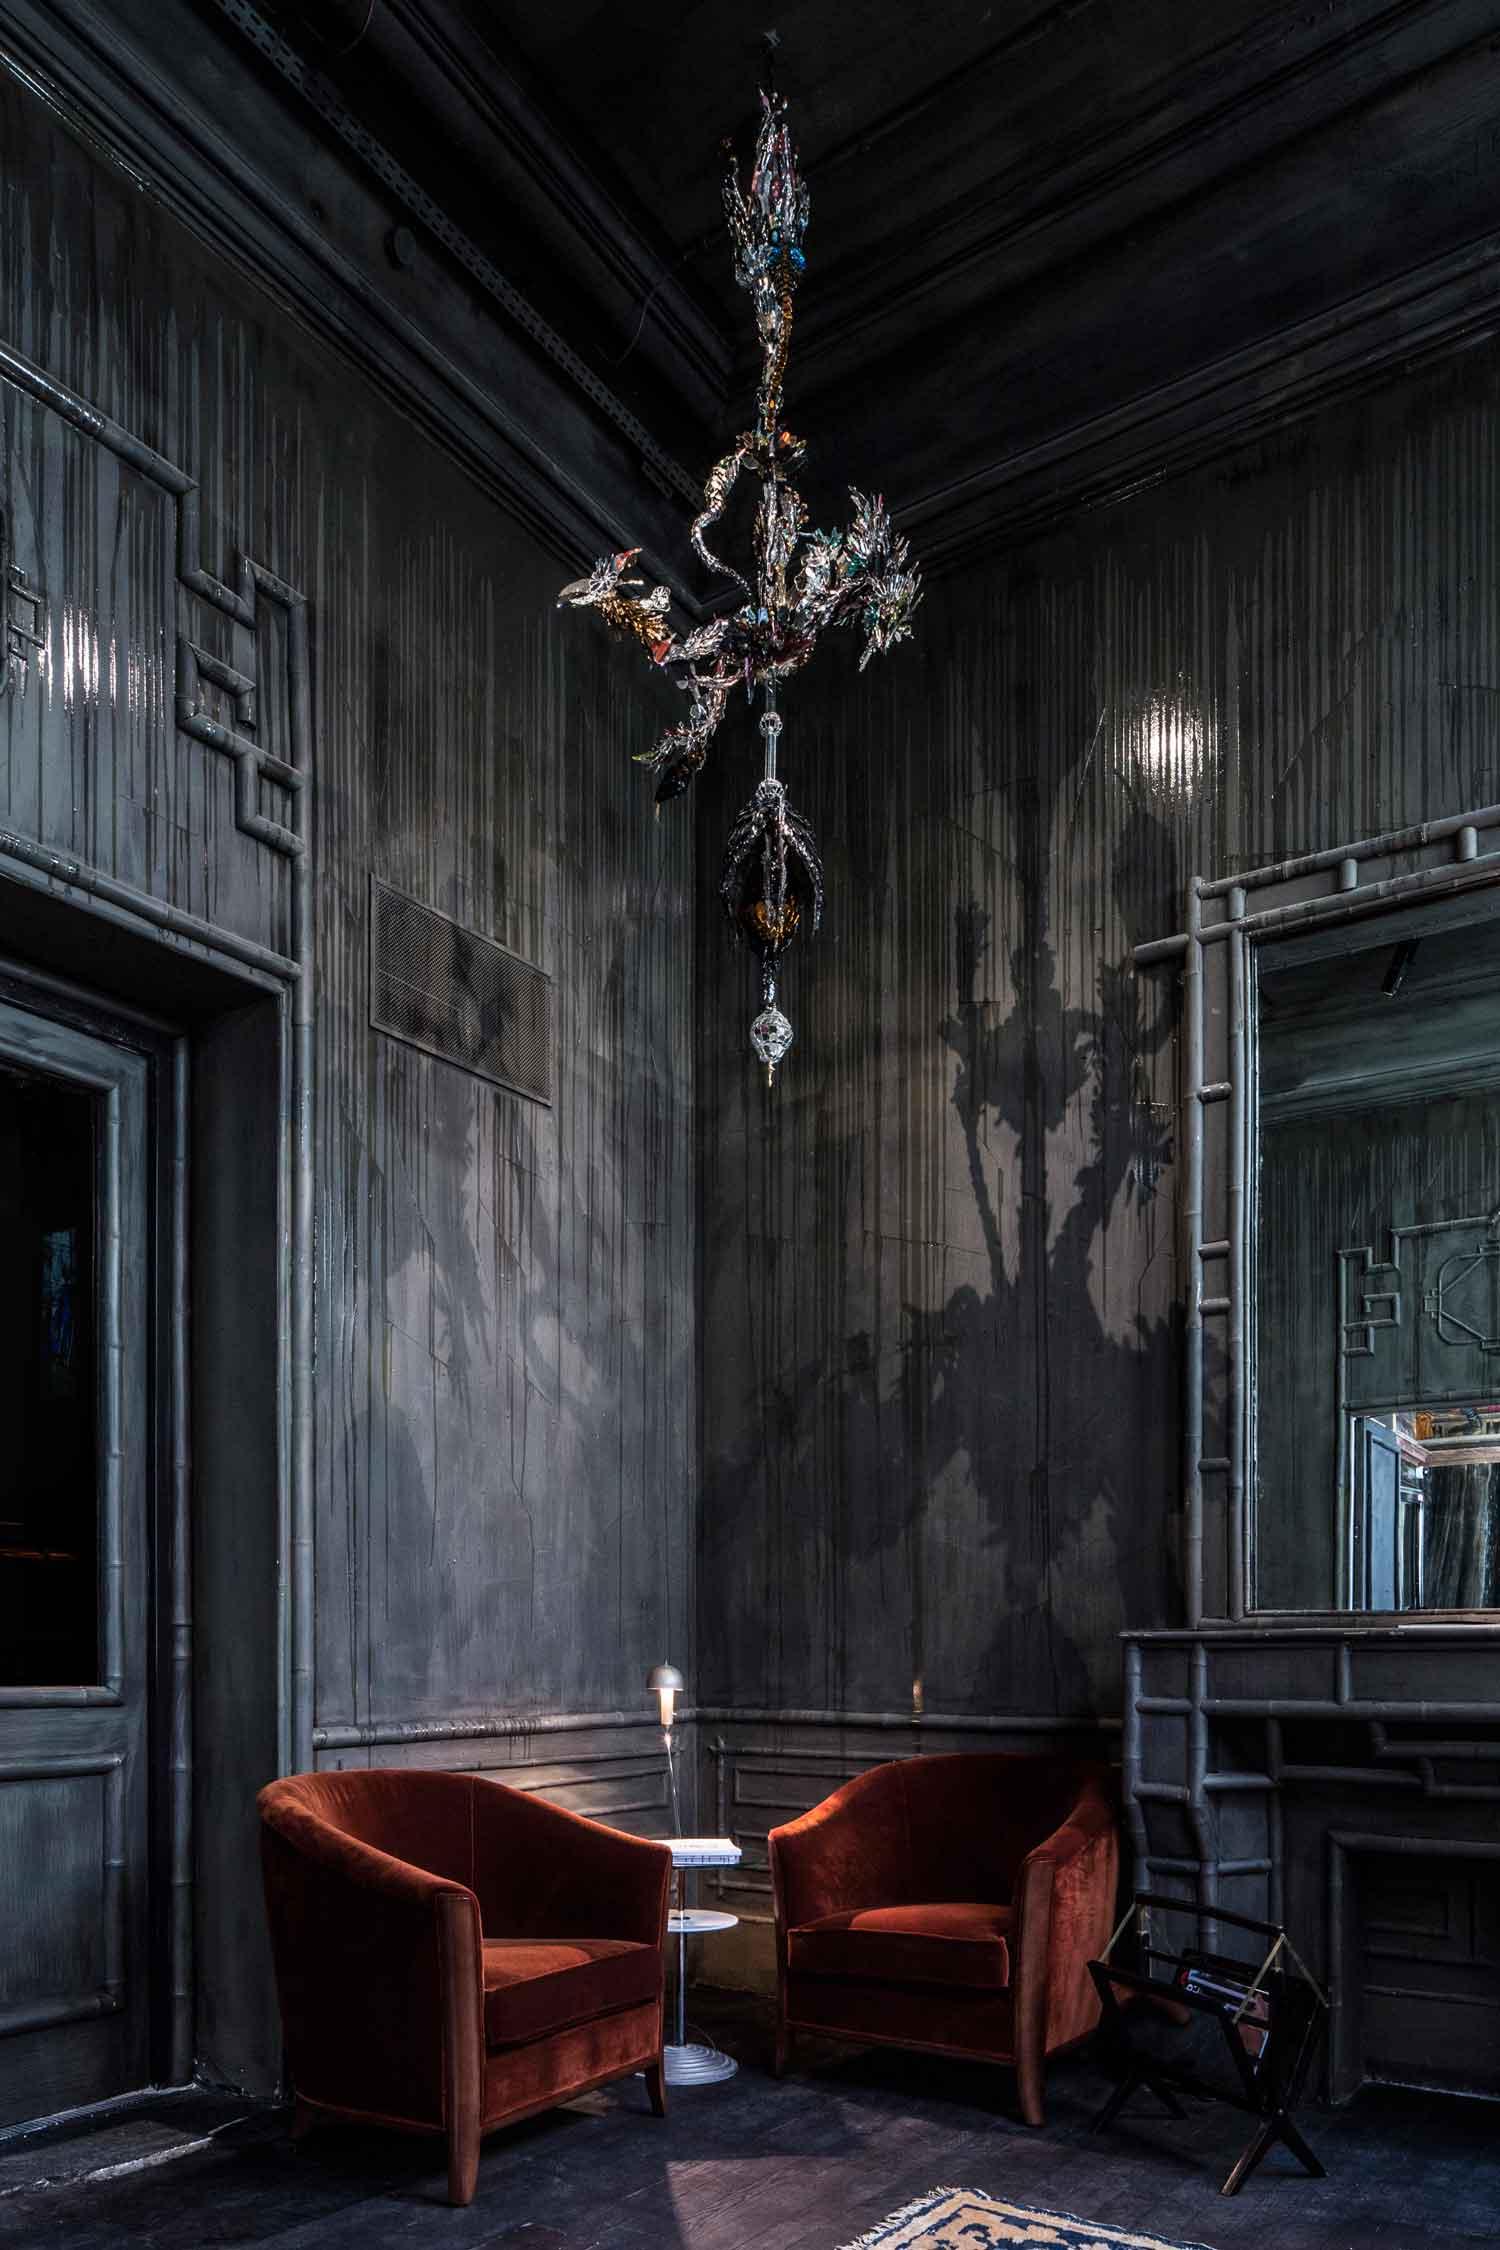 Legendary nightclub les bains paris becomes a luxury hotel